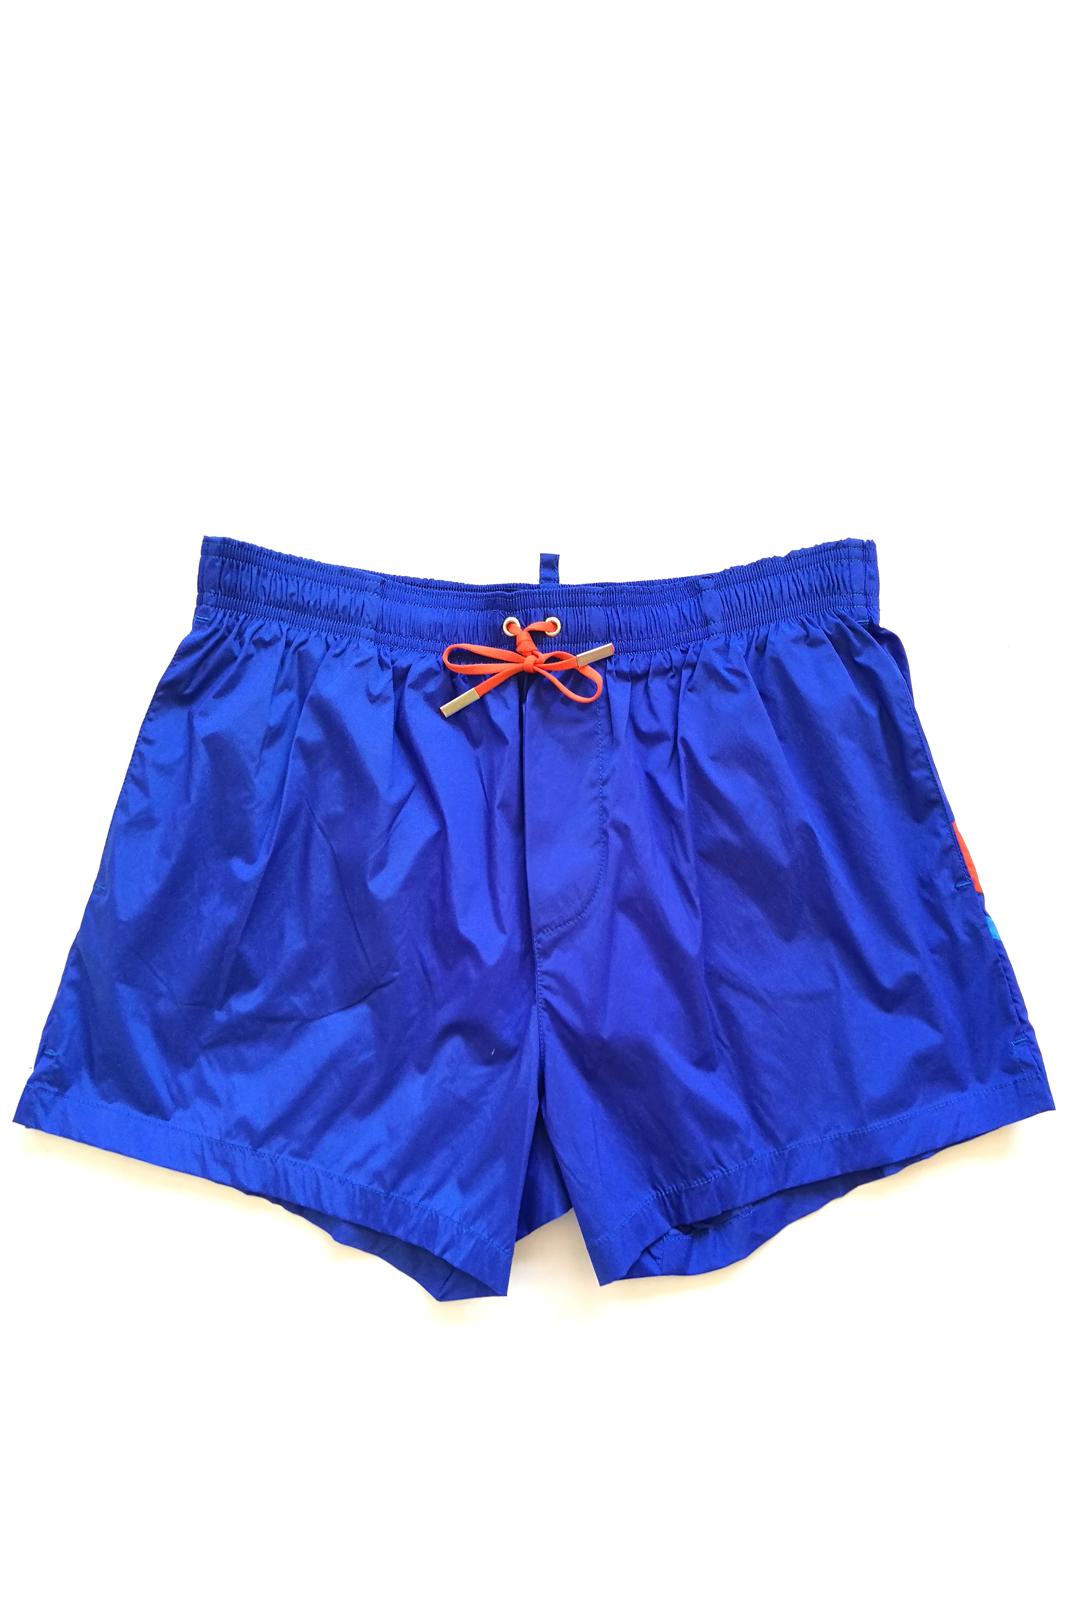 Shorts de bain  Dsquared2 D7B642640 33050 BLEU